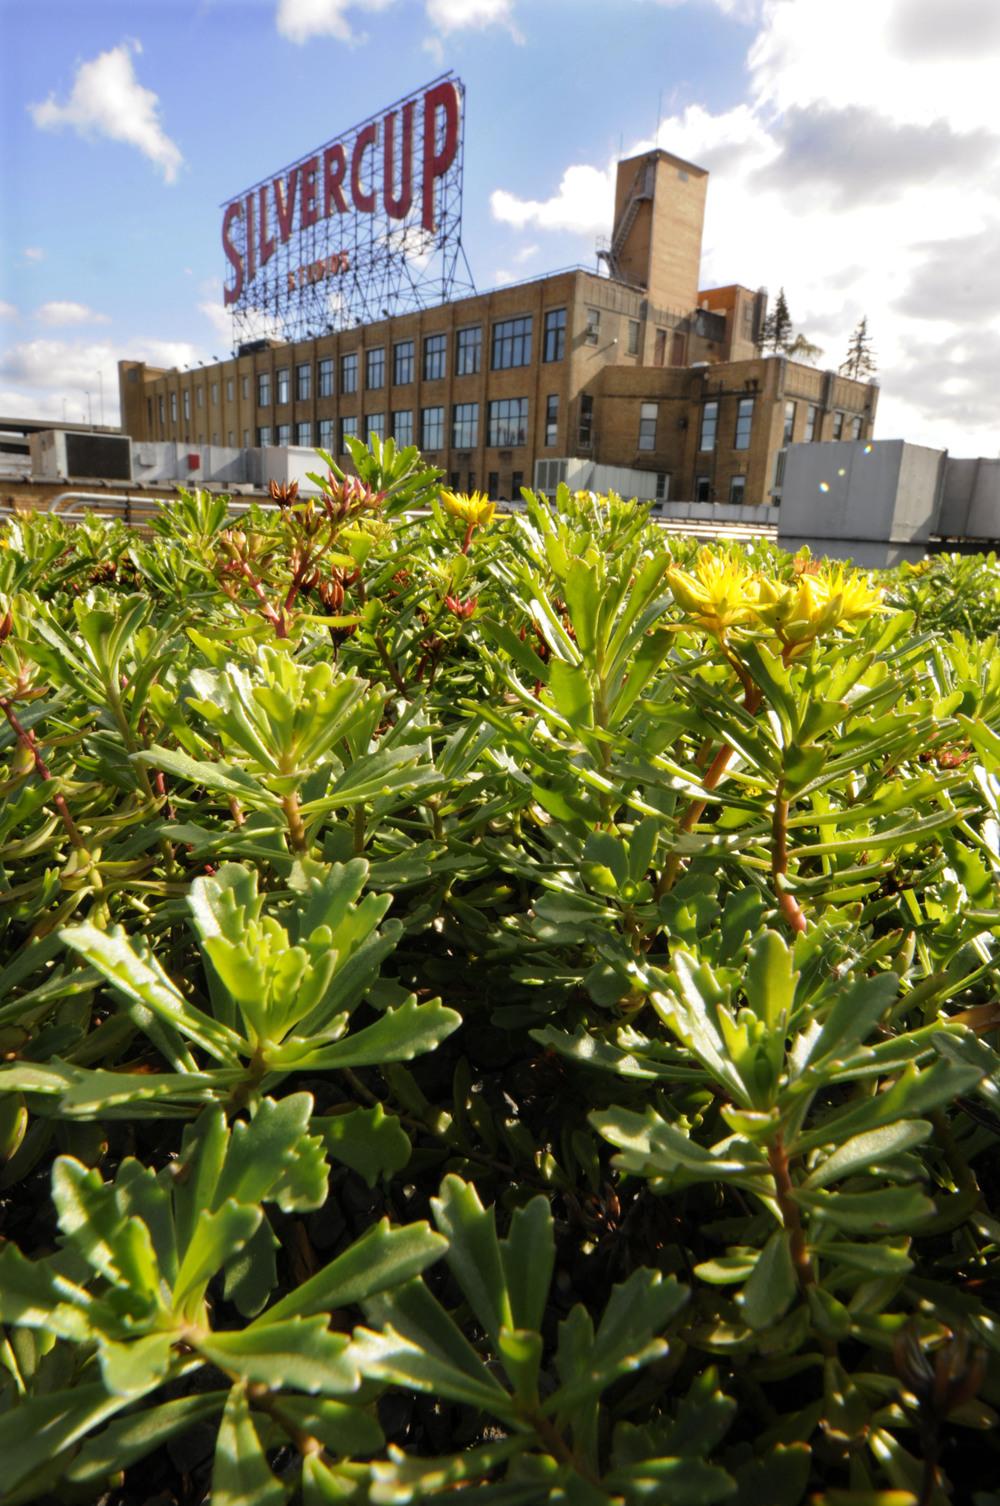 BA_Silvercup_Planting 1_Mark Dye.jpg